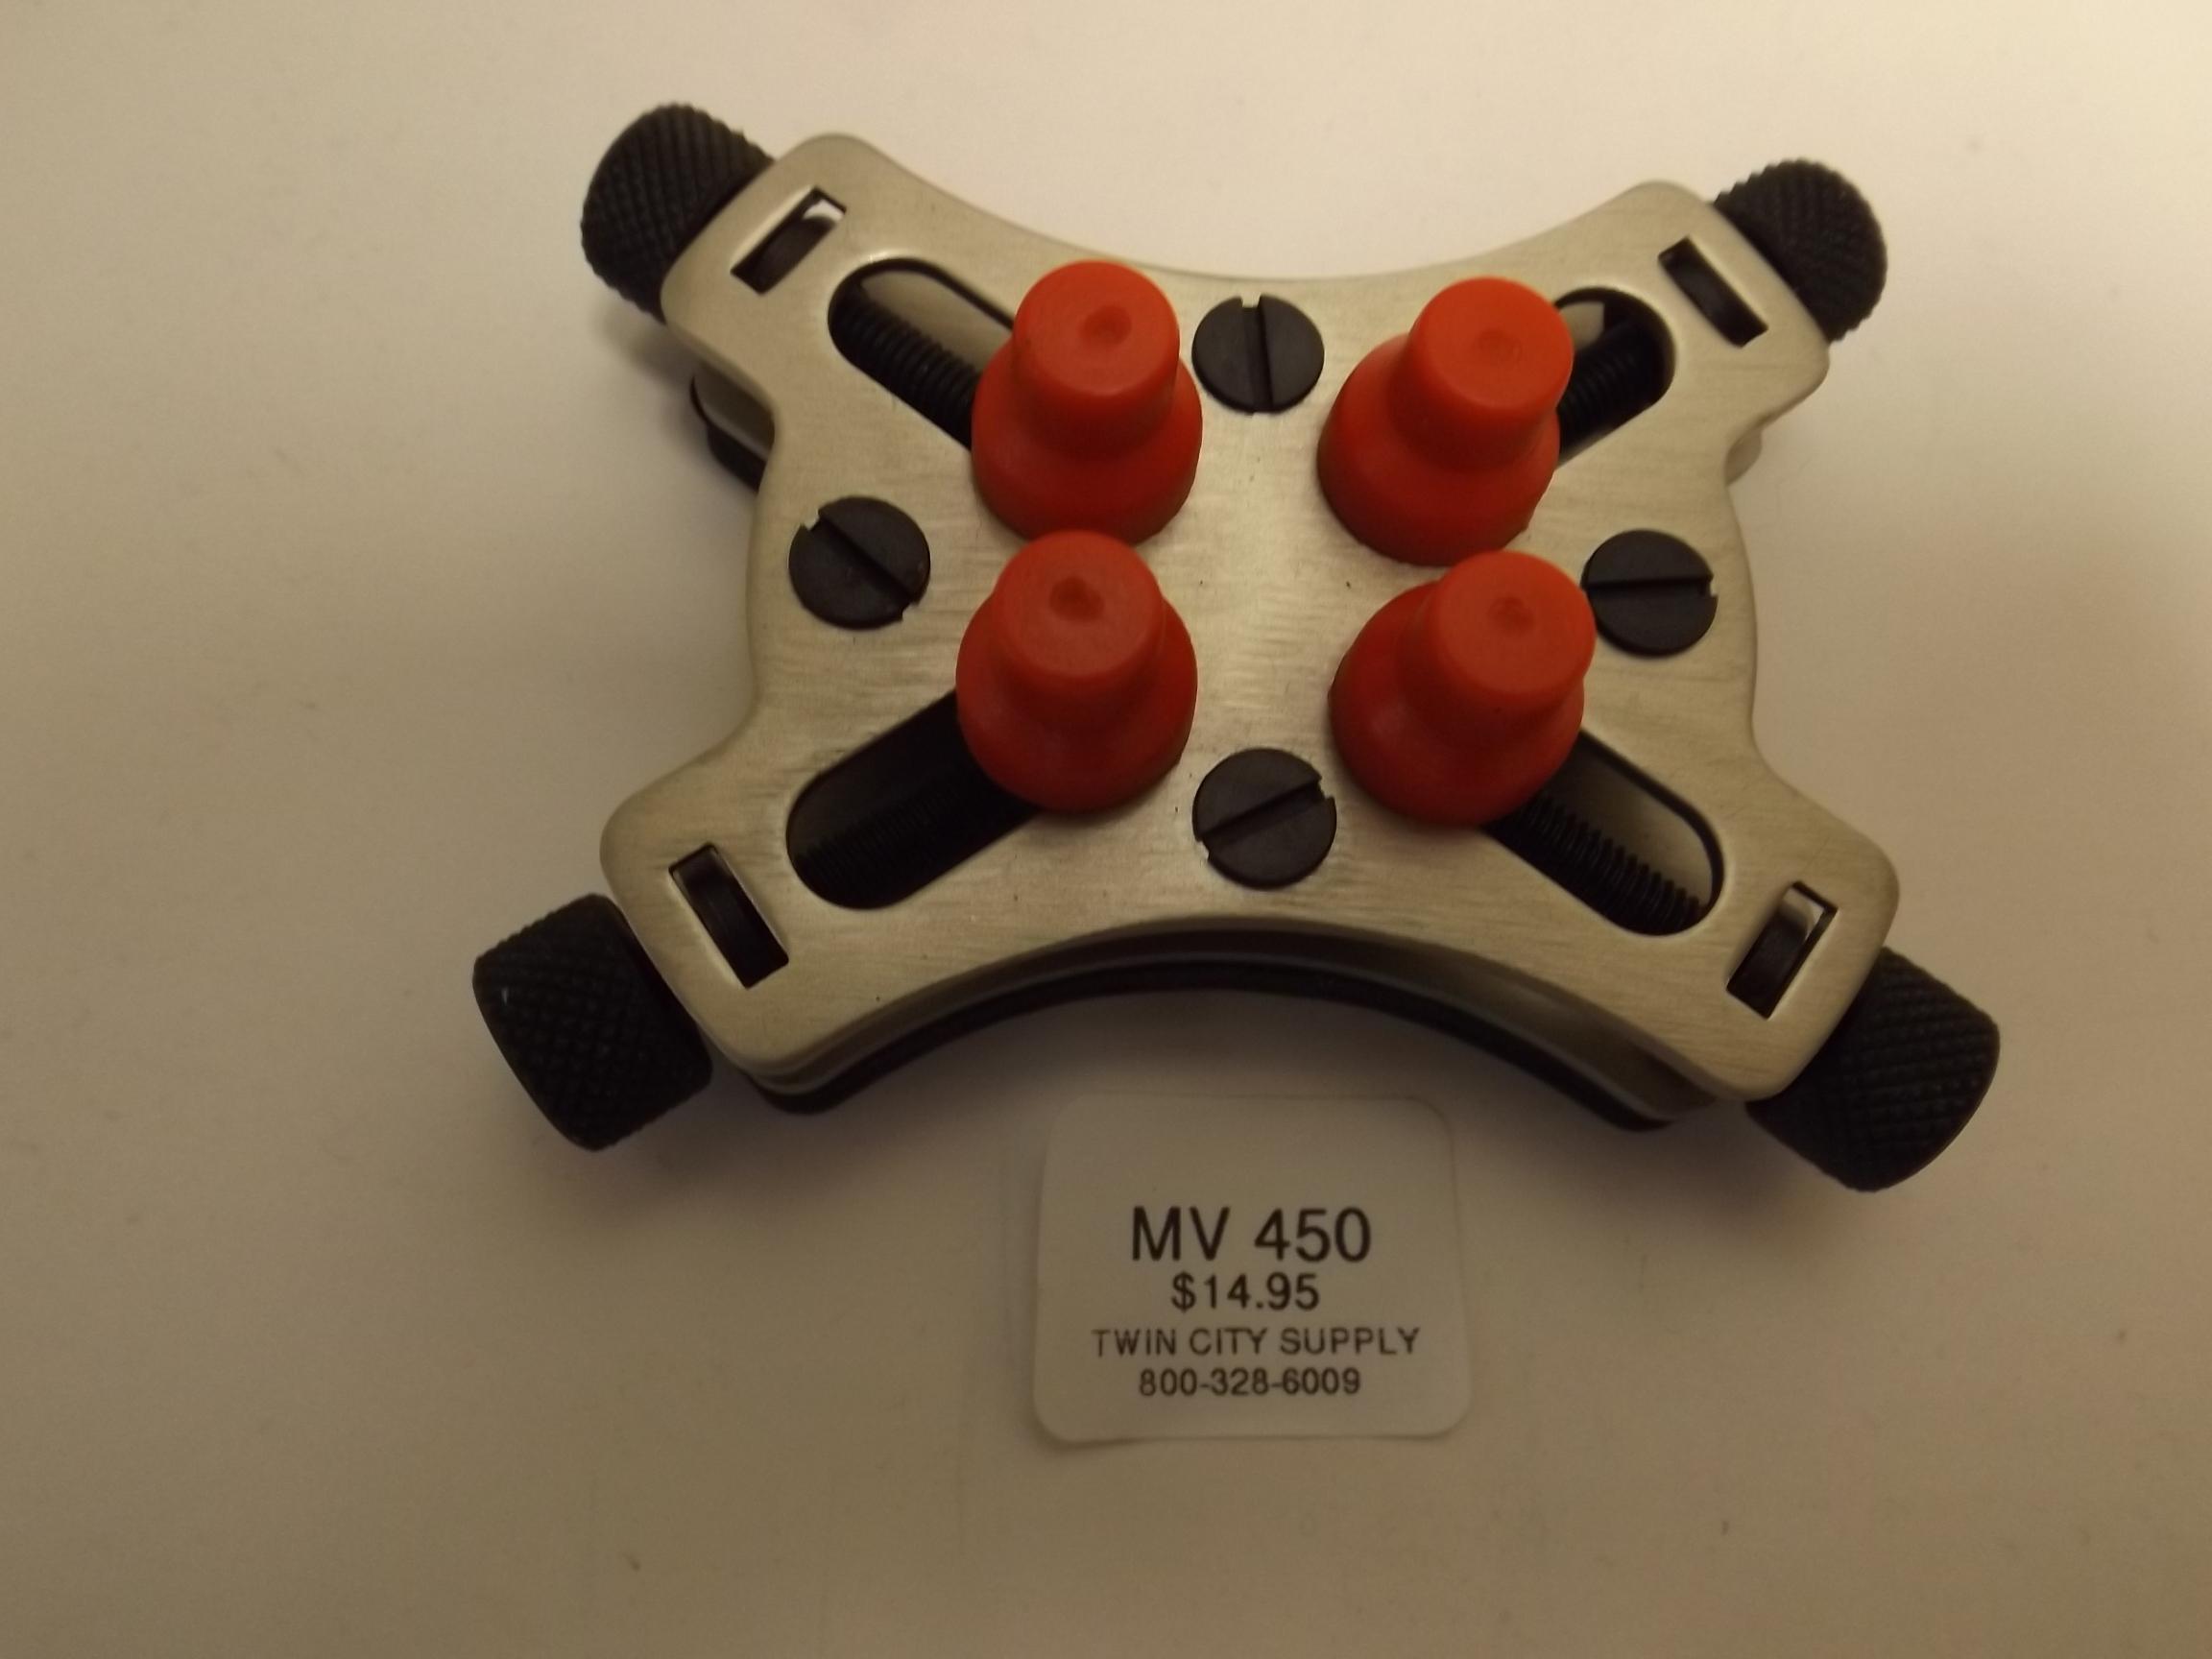 MV450 New! Watch Case Holder--45 mm Capacity- Anchor/Acon #1611